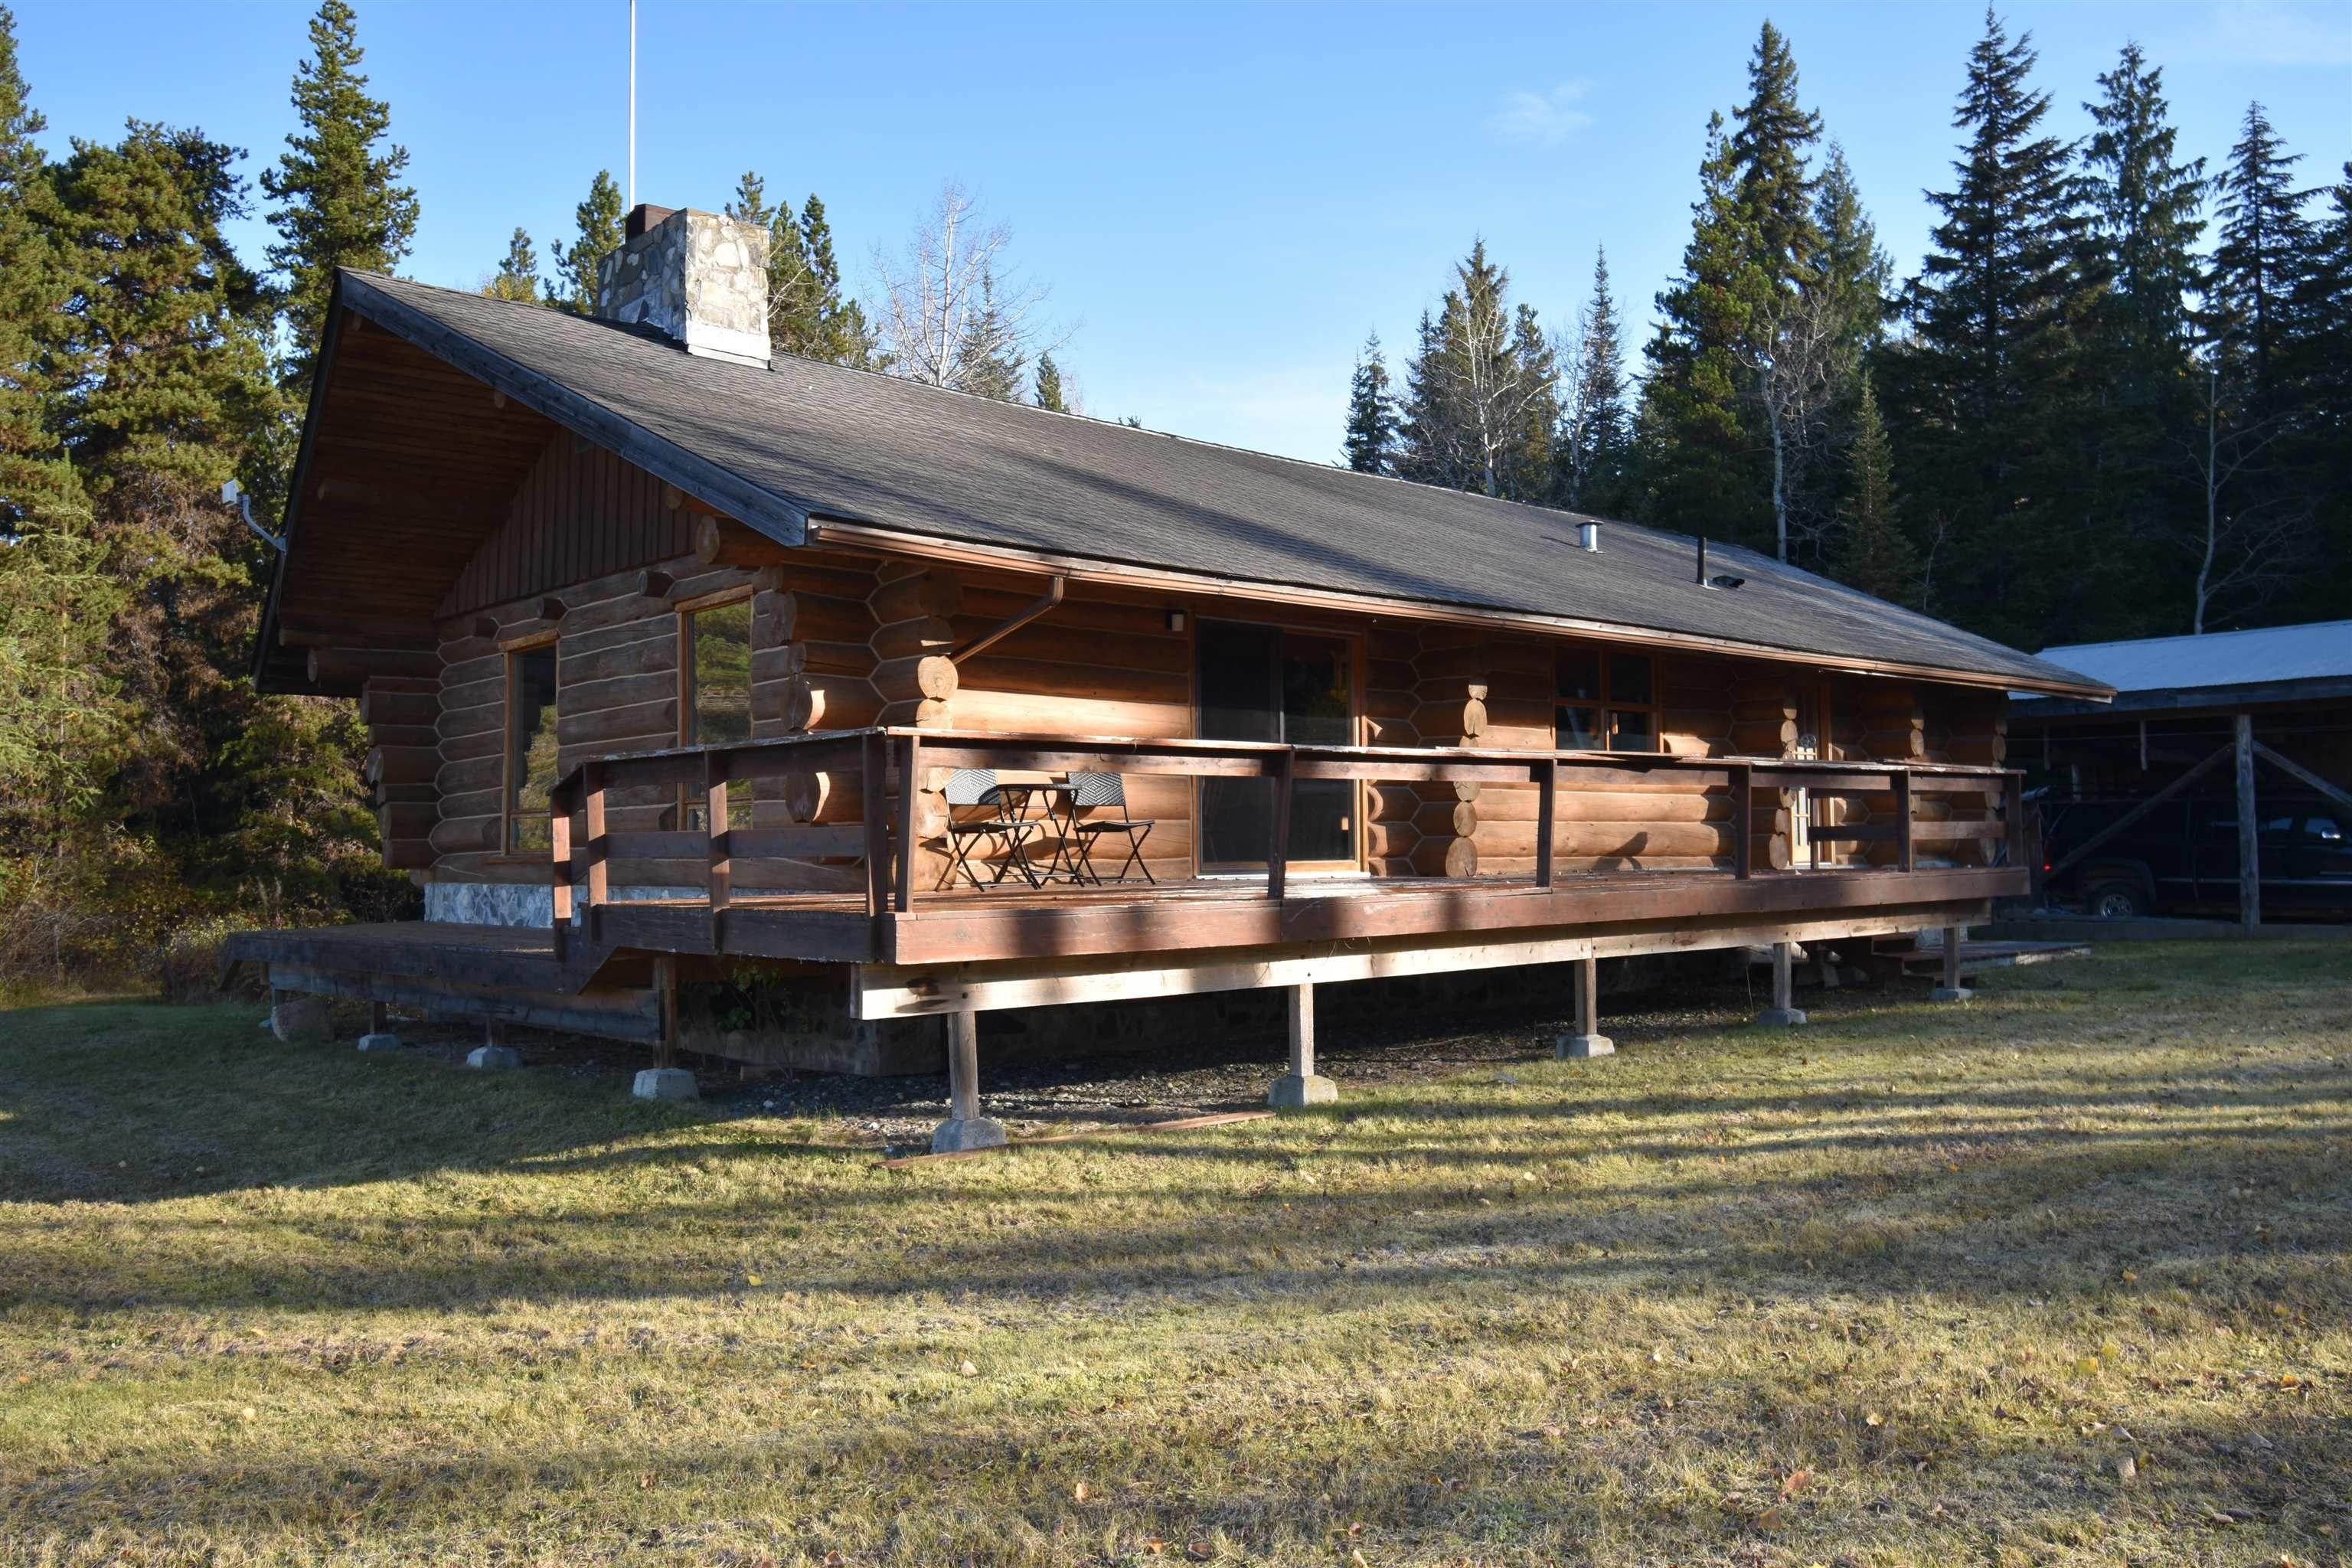 Main Photo: 3560 HOBENSHIELD Road: Kitwanga House for sale (Smithers And Area (Zone 54))  : MLS®# R2620973